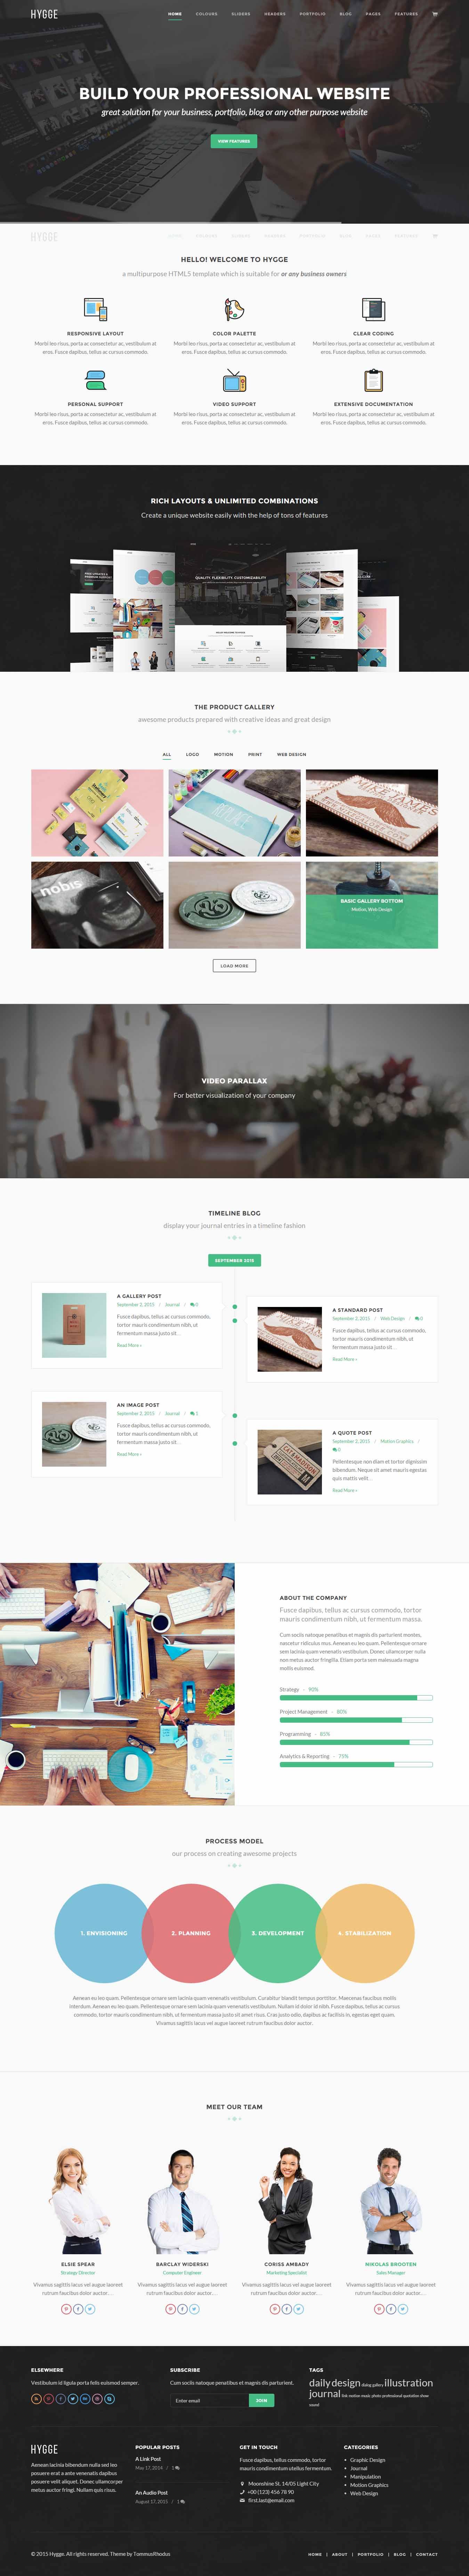 hygge flat and responsive wordpress theme